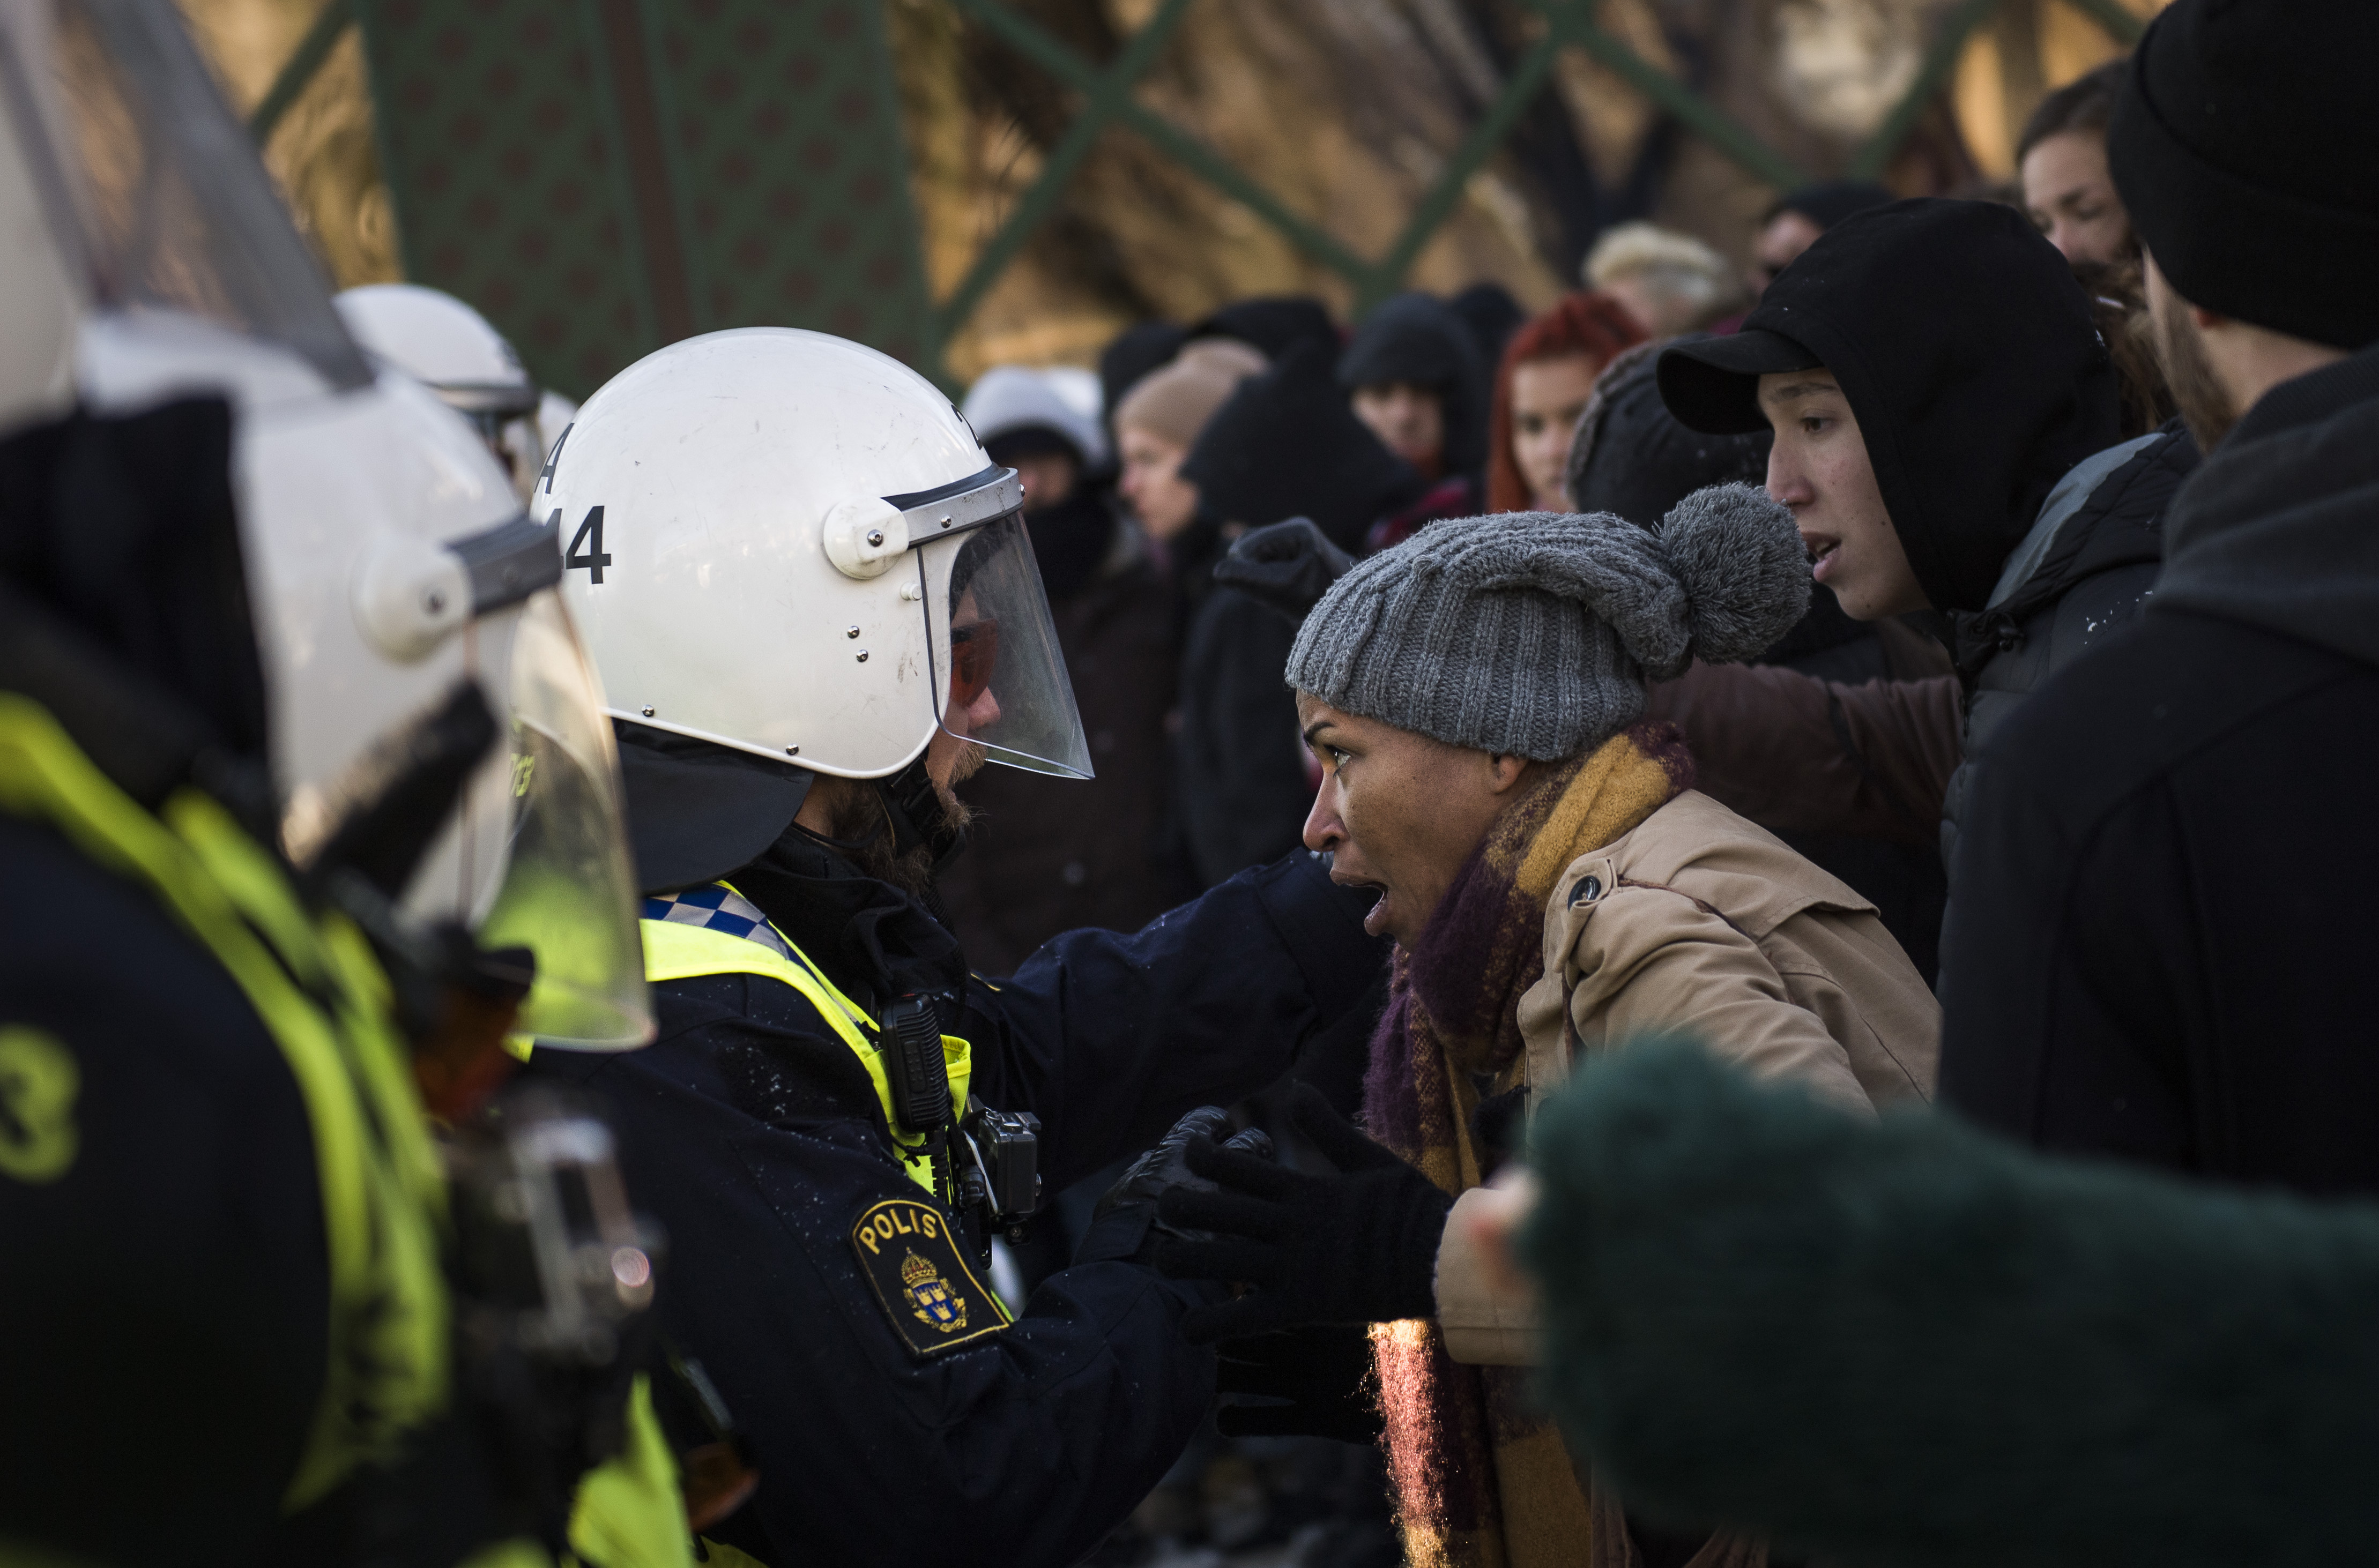 SWEDEN-POLITICS-SOCIAL-DEMO